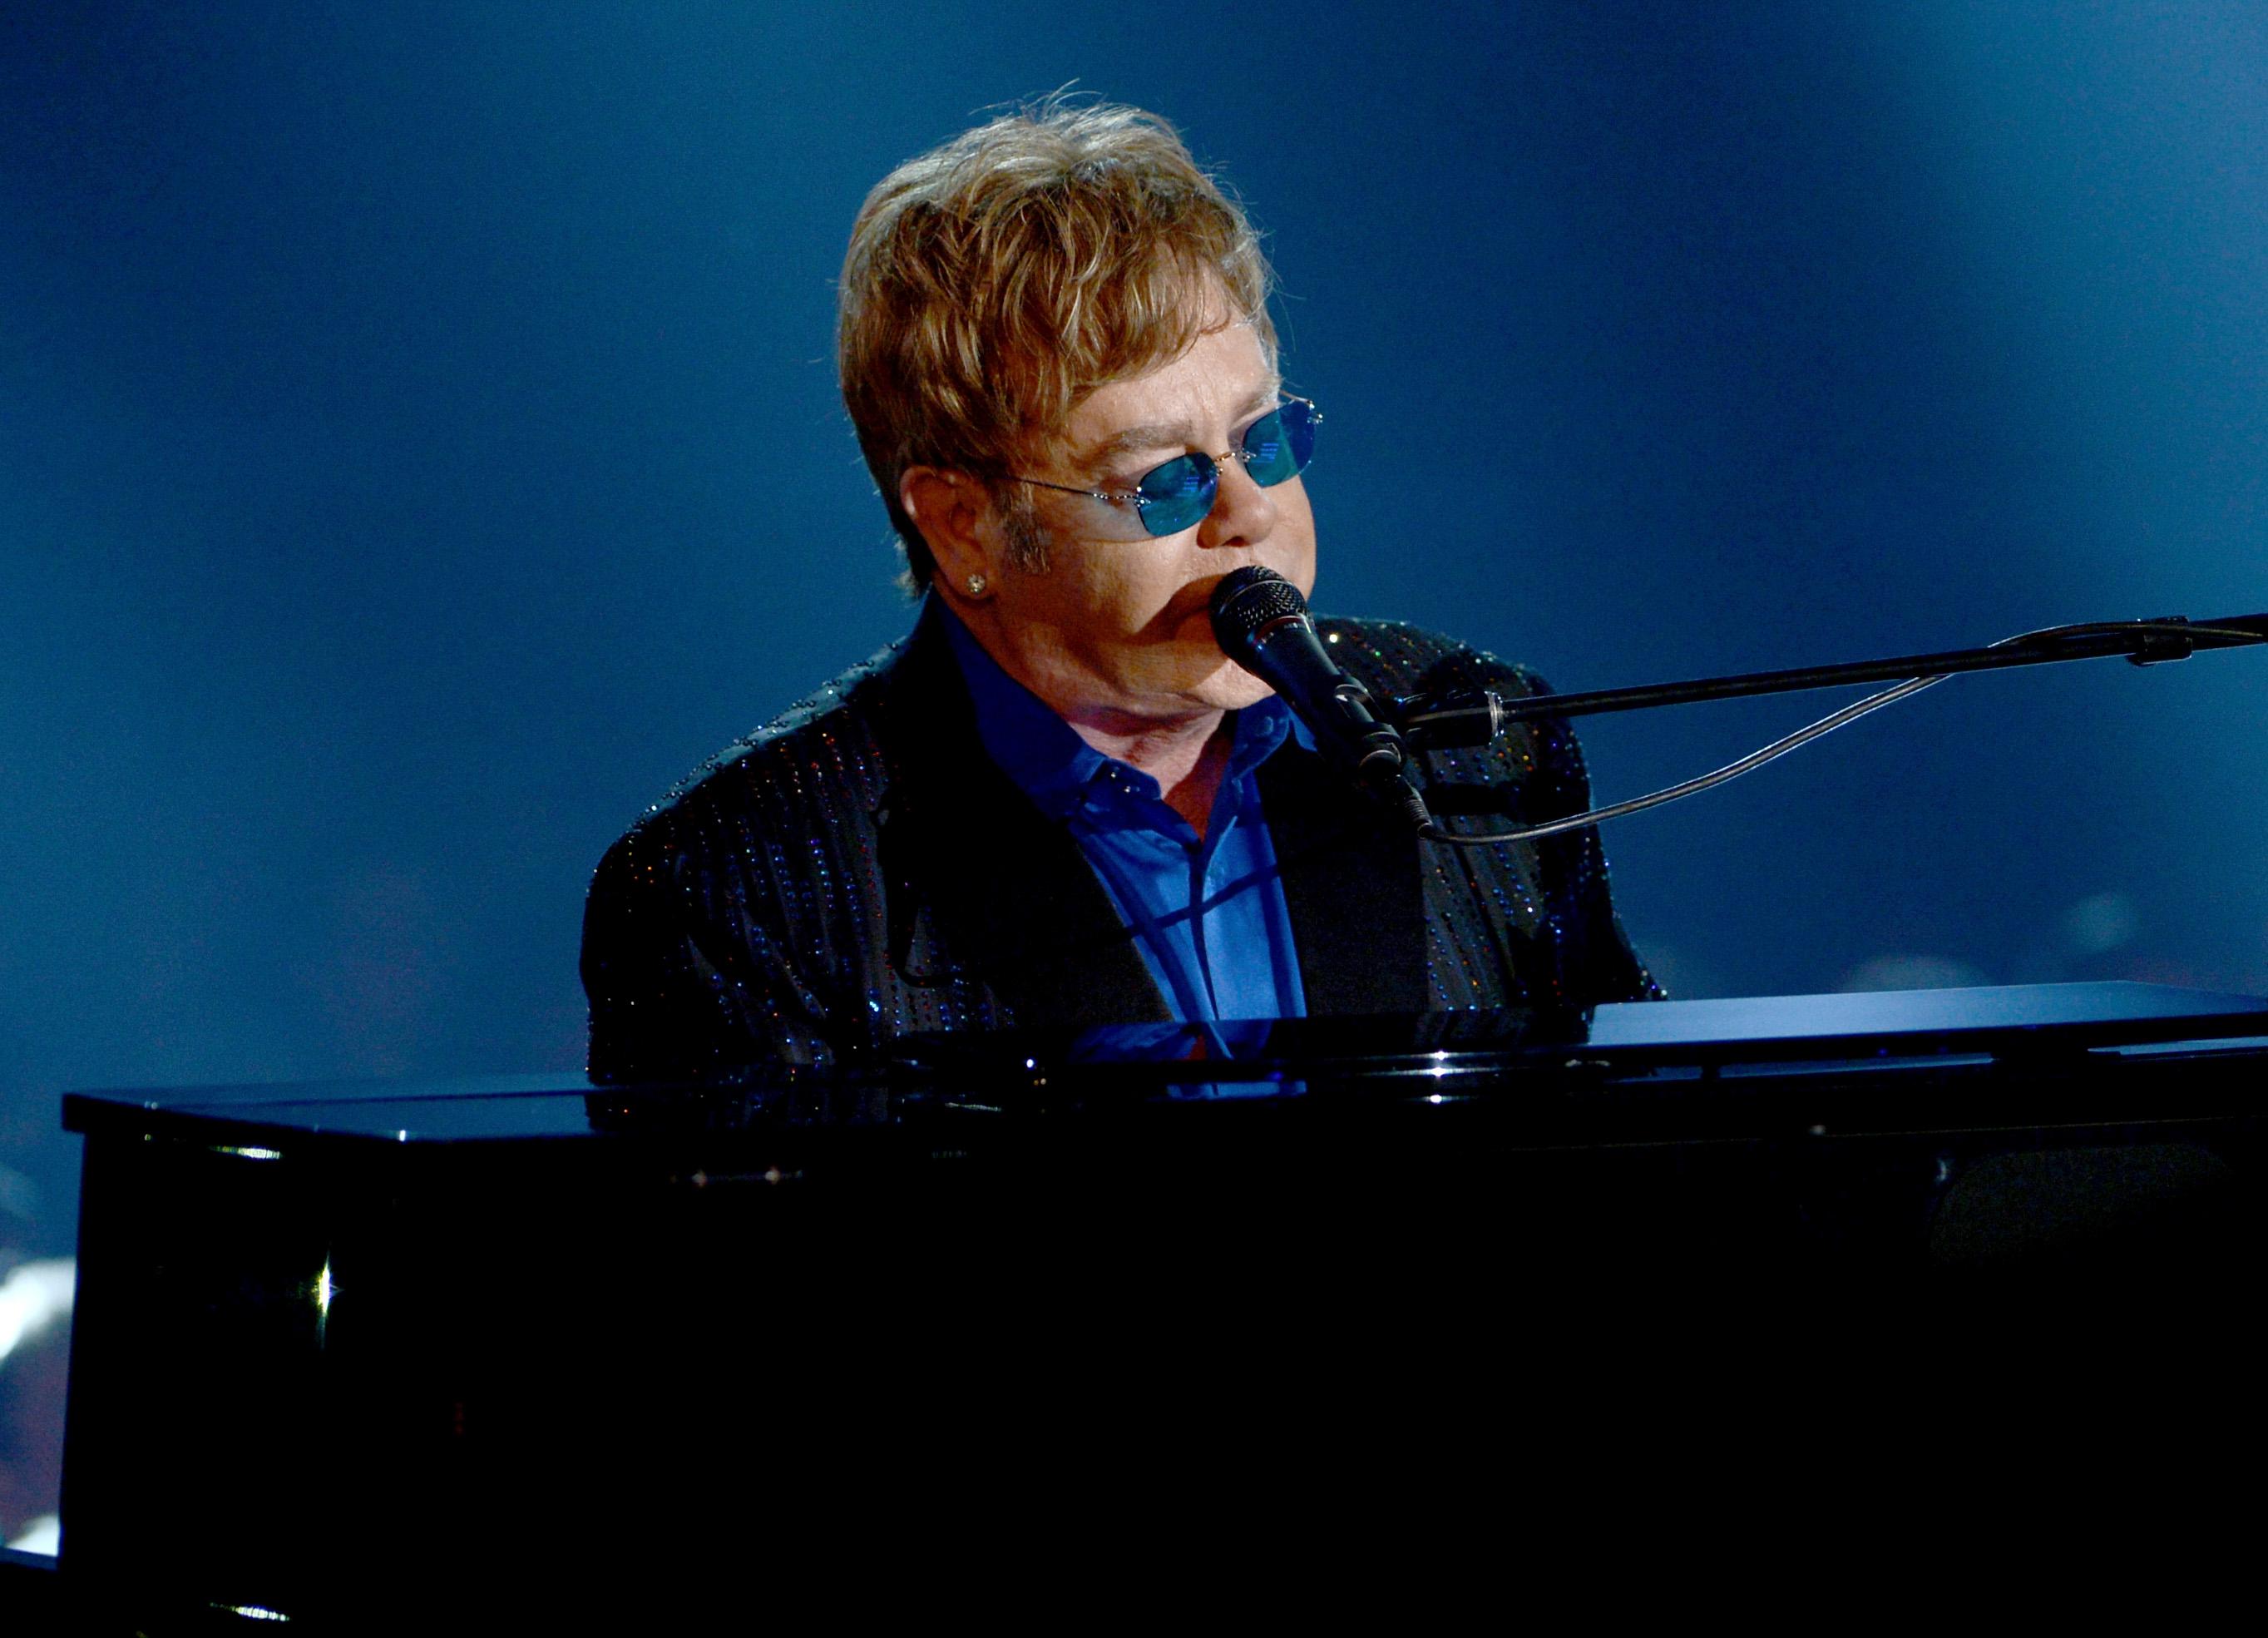 Elton John performed during the show.